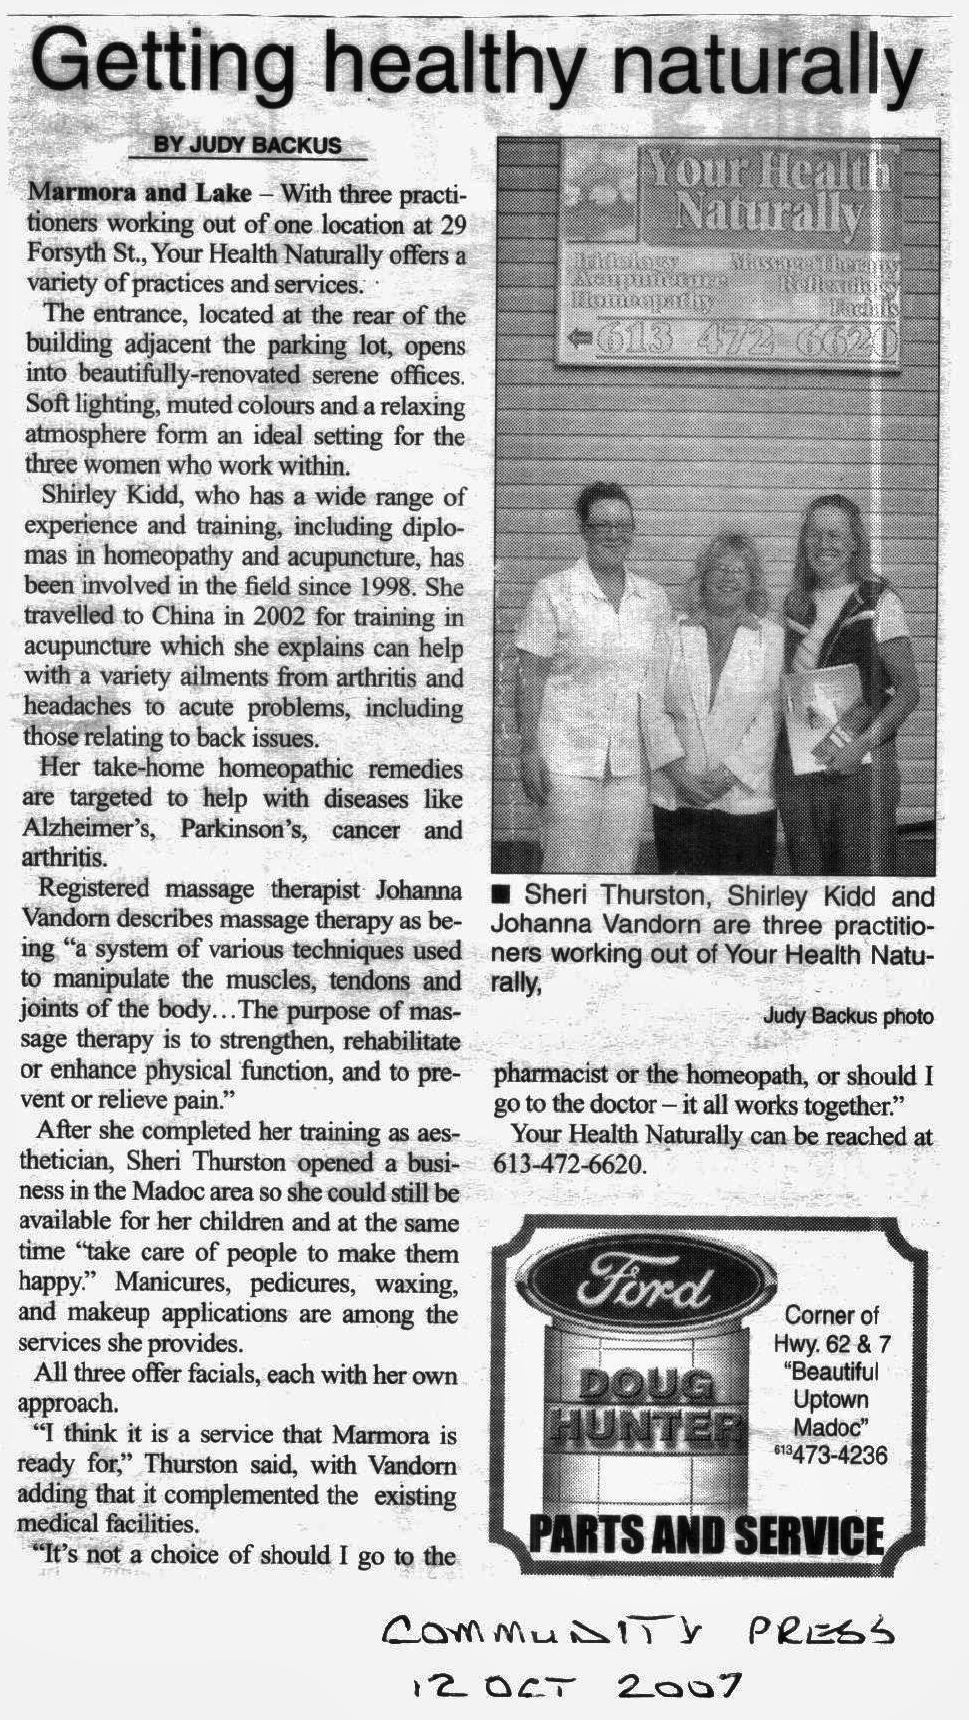 2007 Shirley Kidd, Natural Health29 Forsyth St clippings 016.jpg